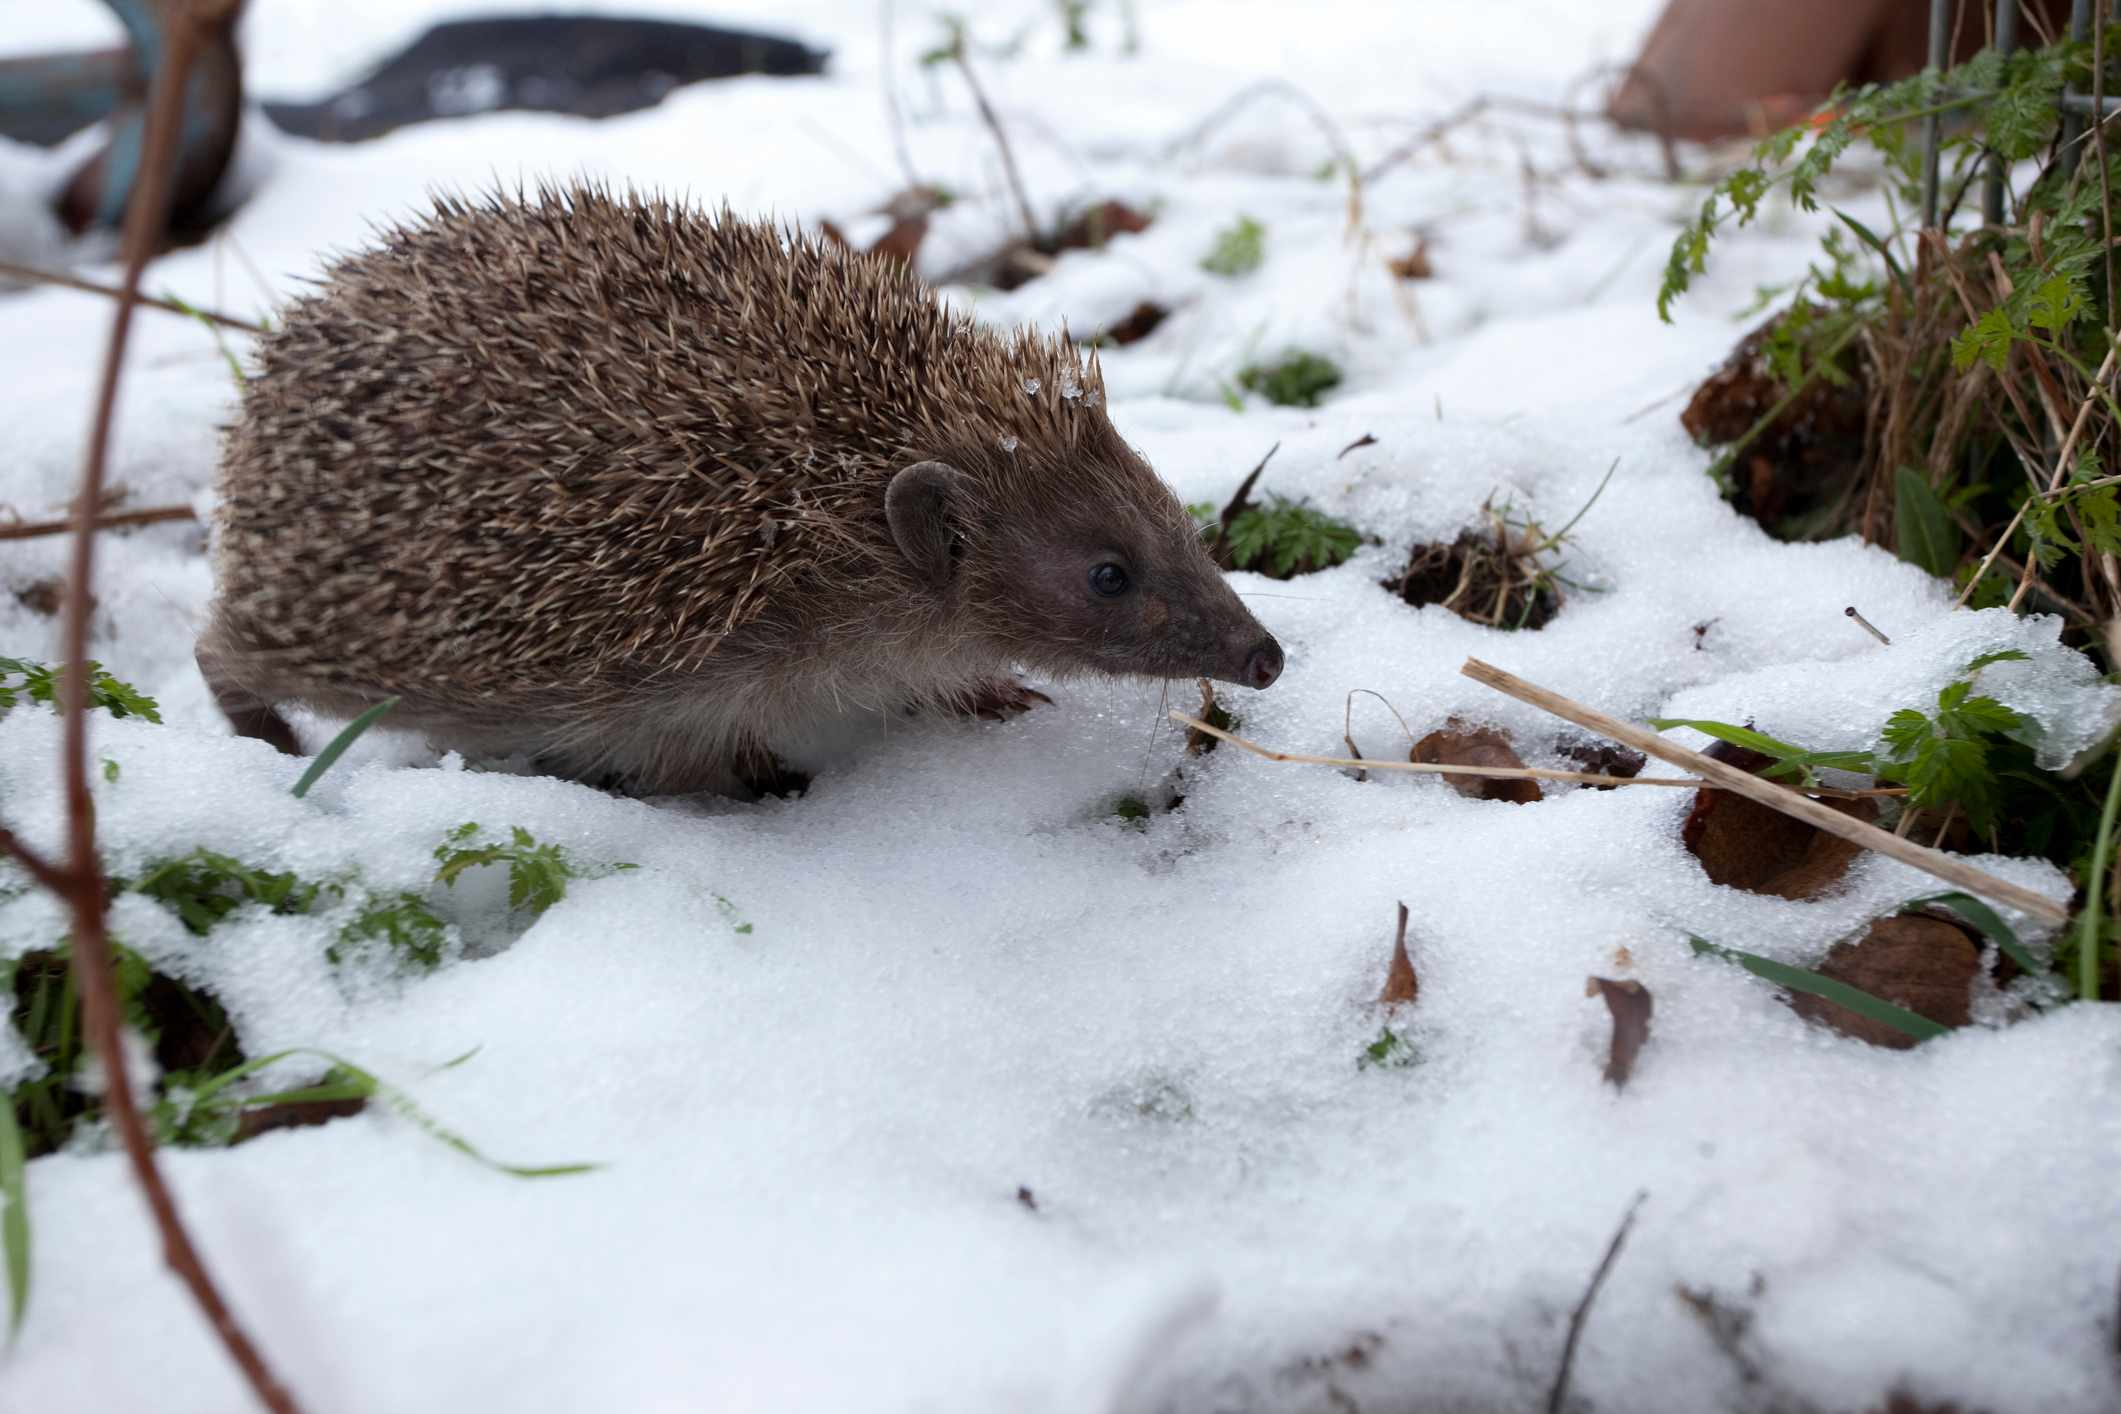 European Hedgehog, Erinaceus europaeus, snow, adult, mammal, outside